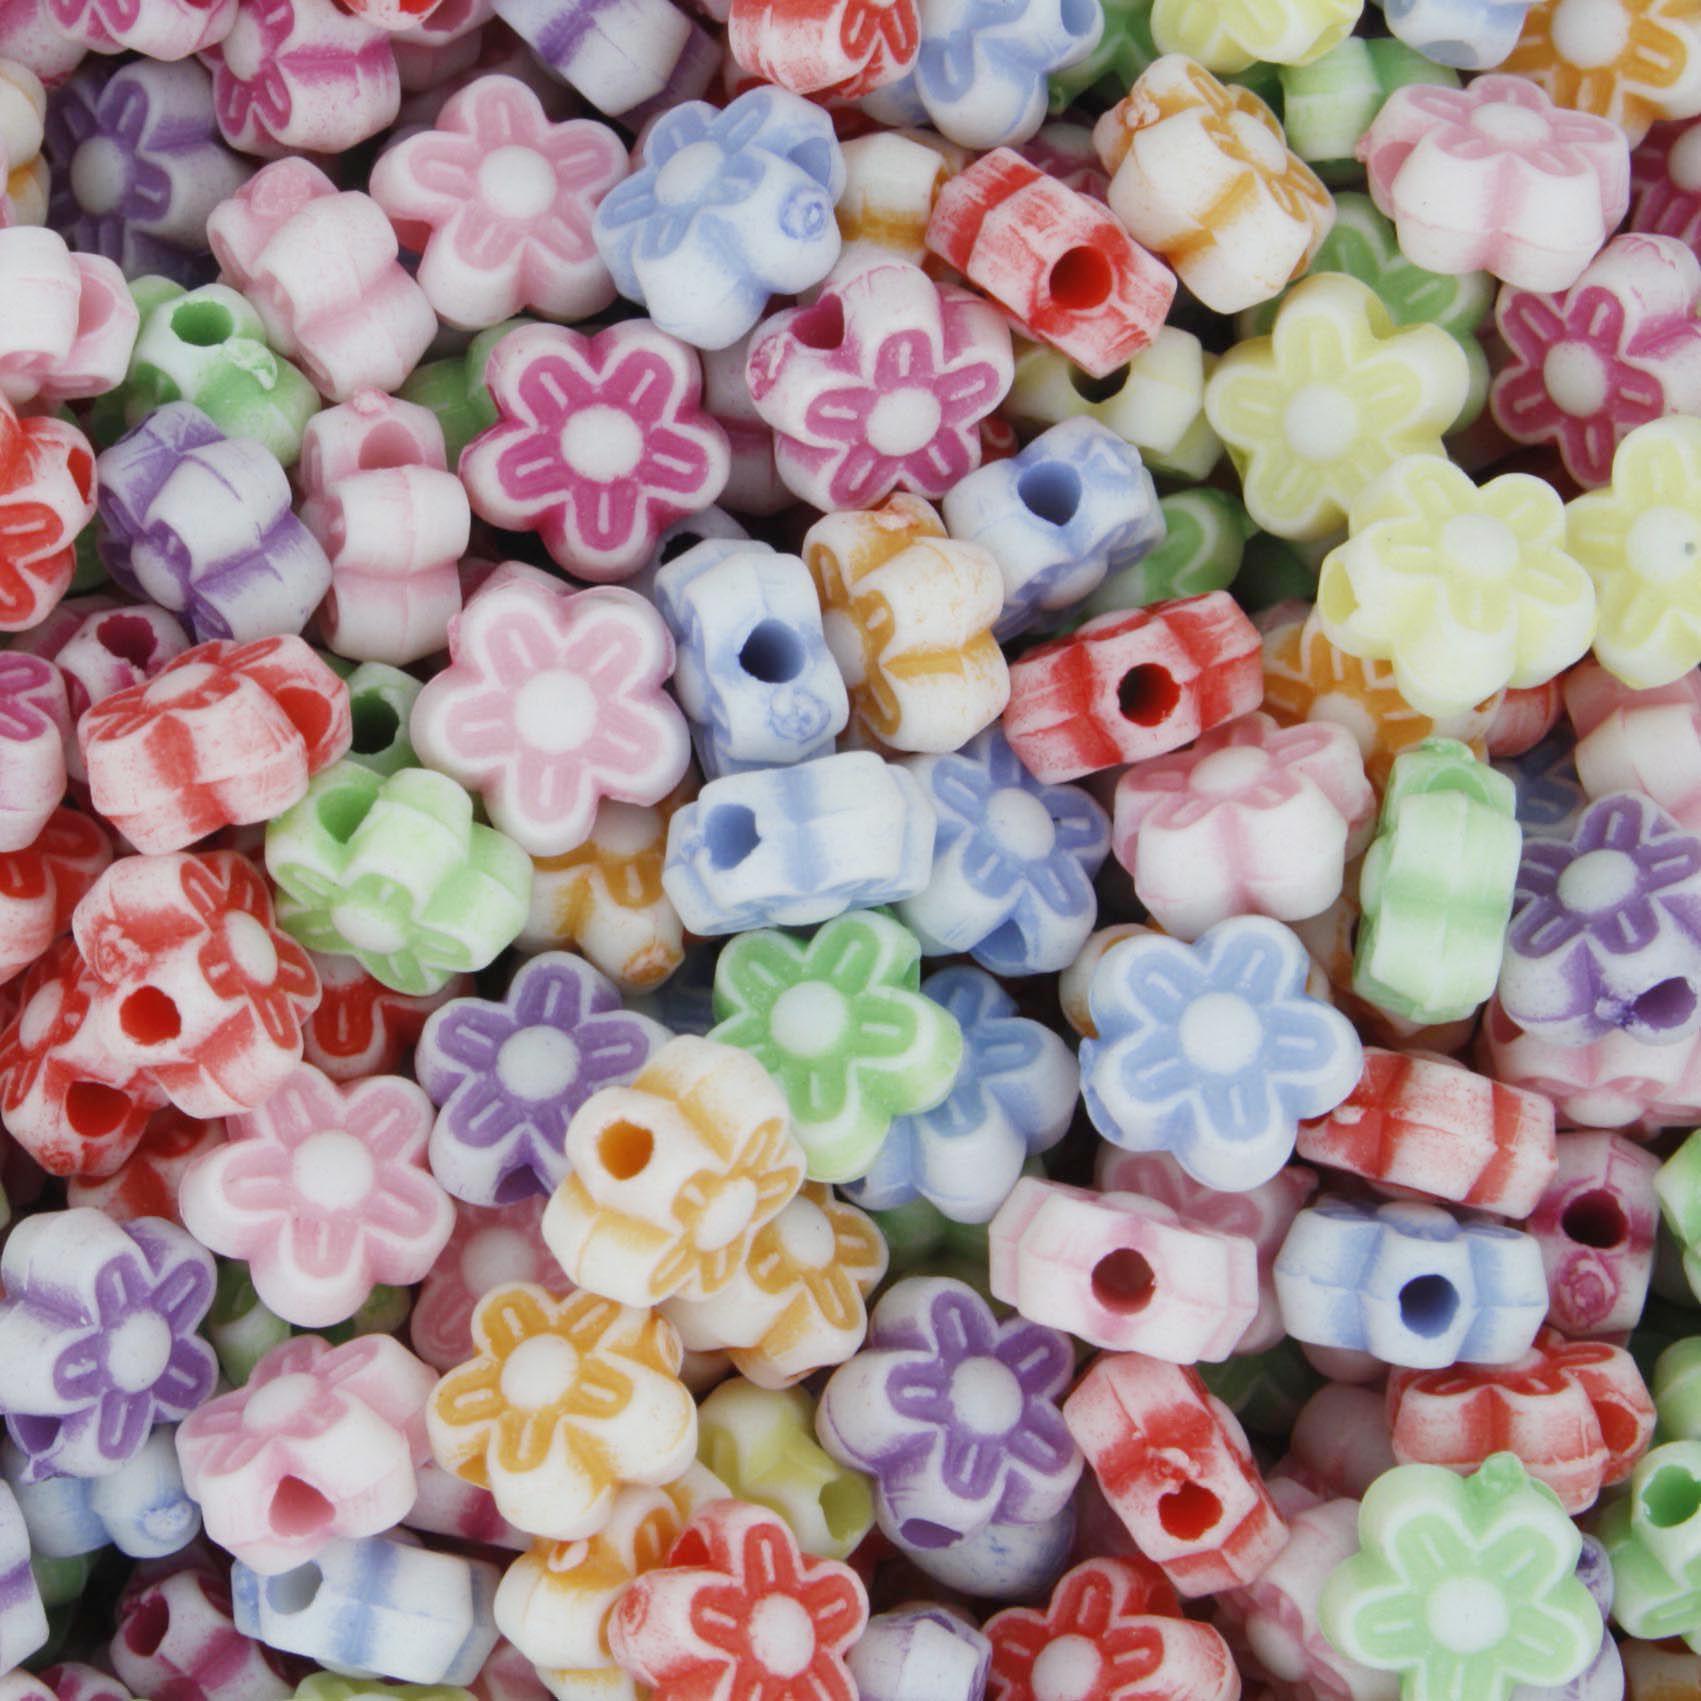 Miçanga Colorida / Infantil - Mini Flor  - Stéphanie Bijoux® - Peças para Bijuterias e Artesanato